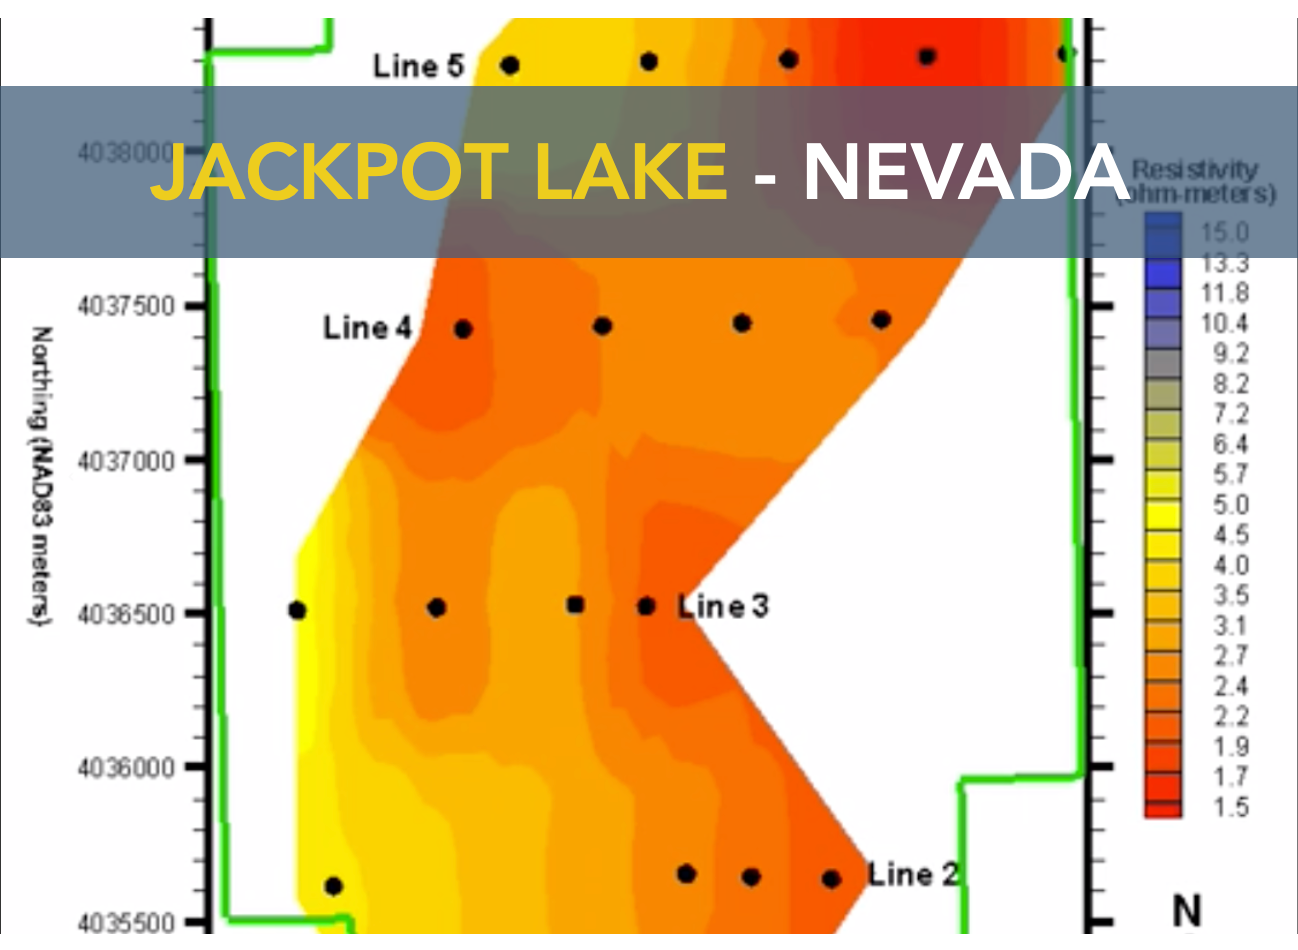 Jackpot Lake - Nevada